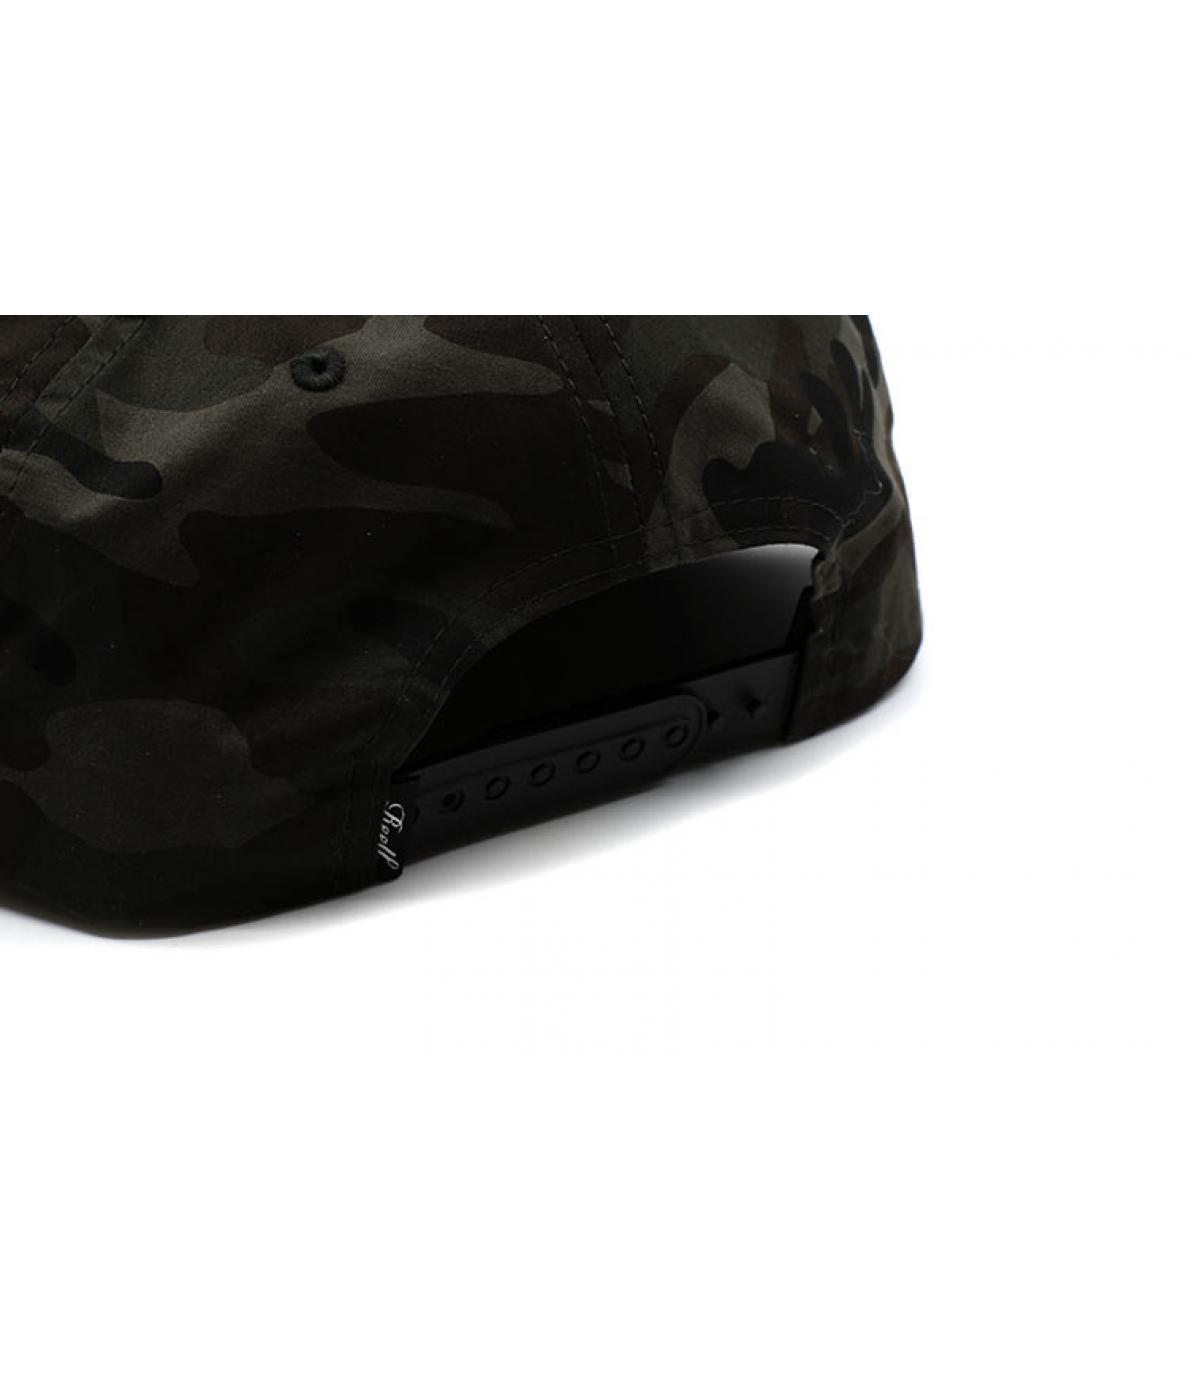 Dettagli Suede Cap camouflage - image 5